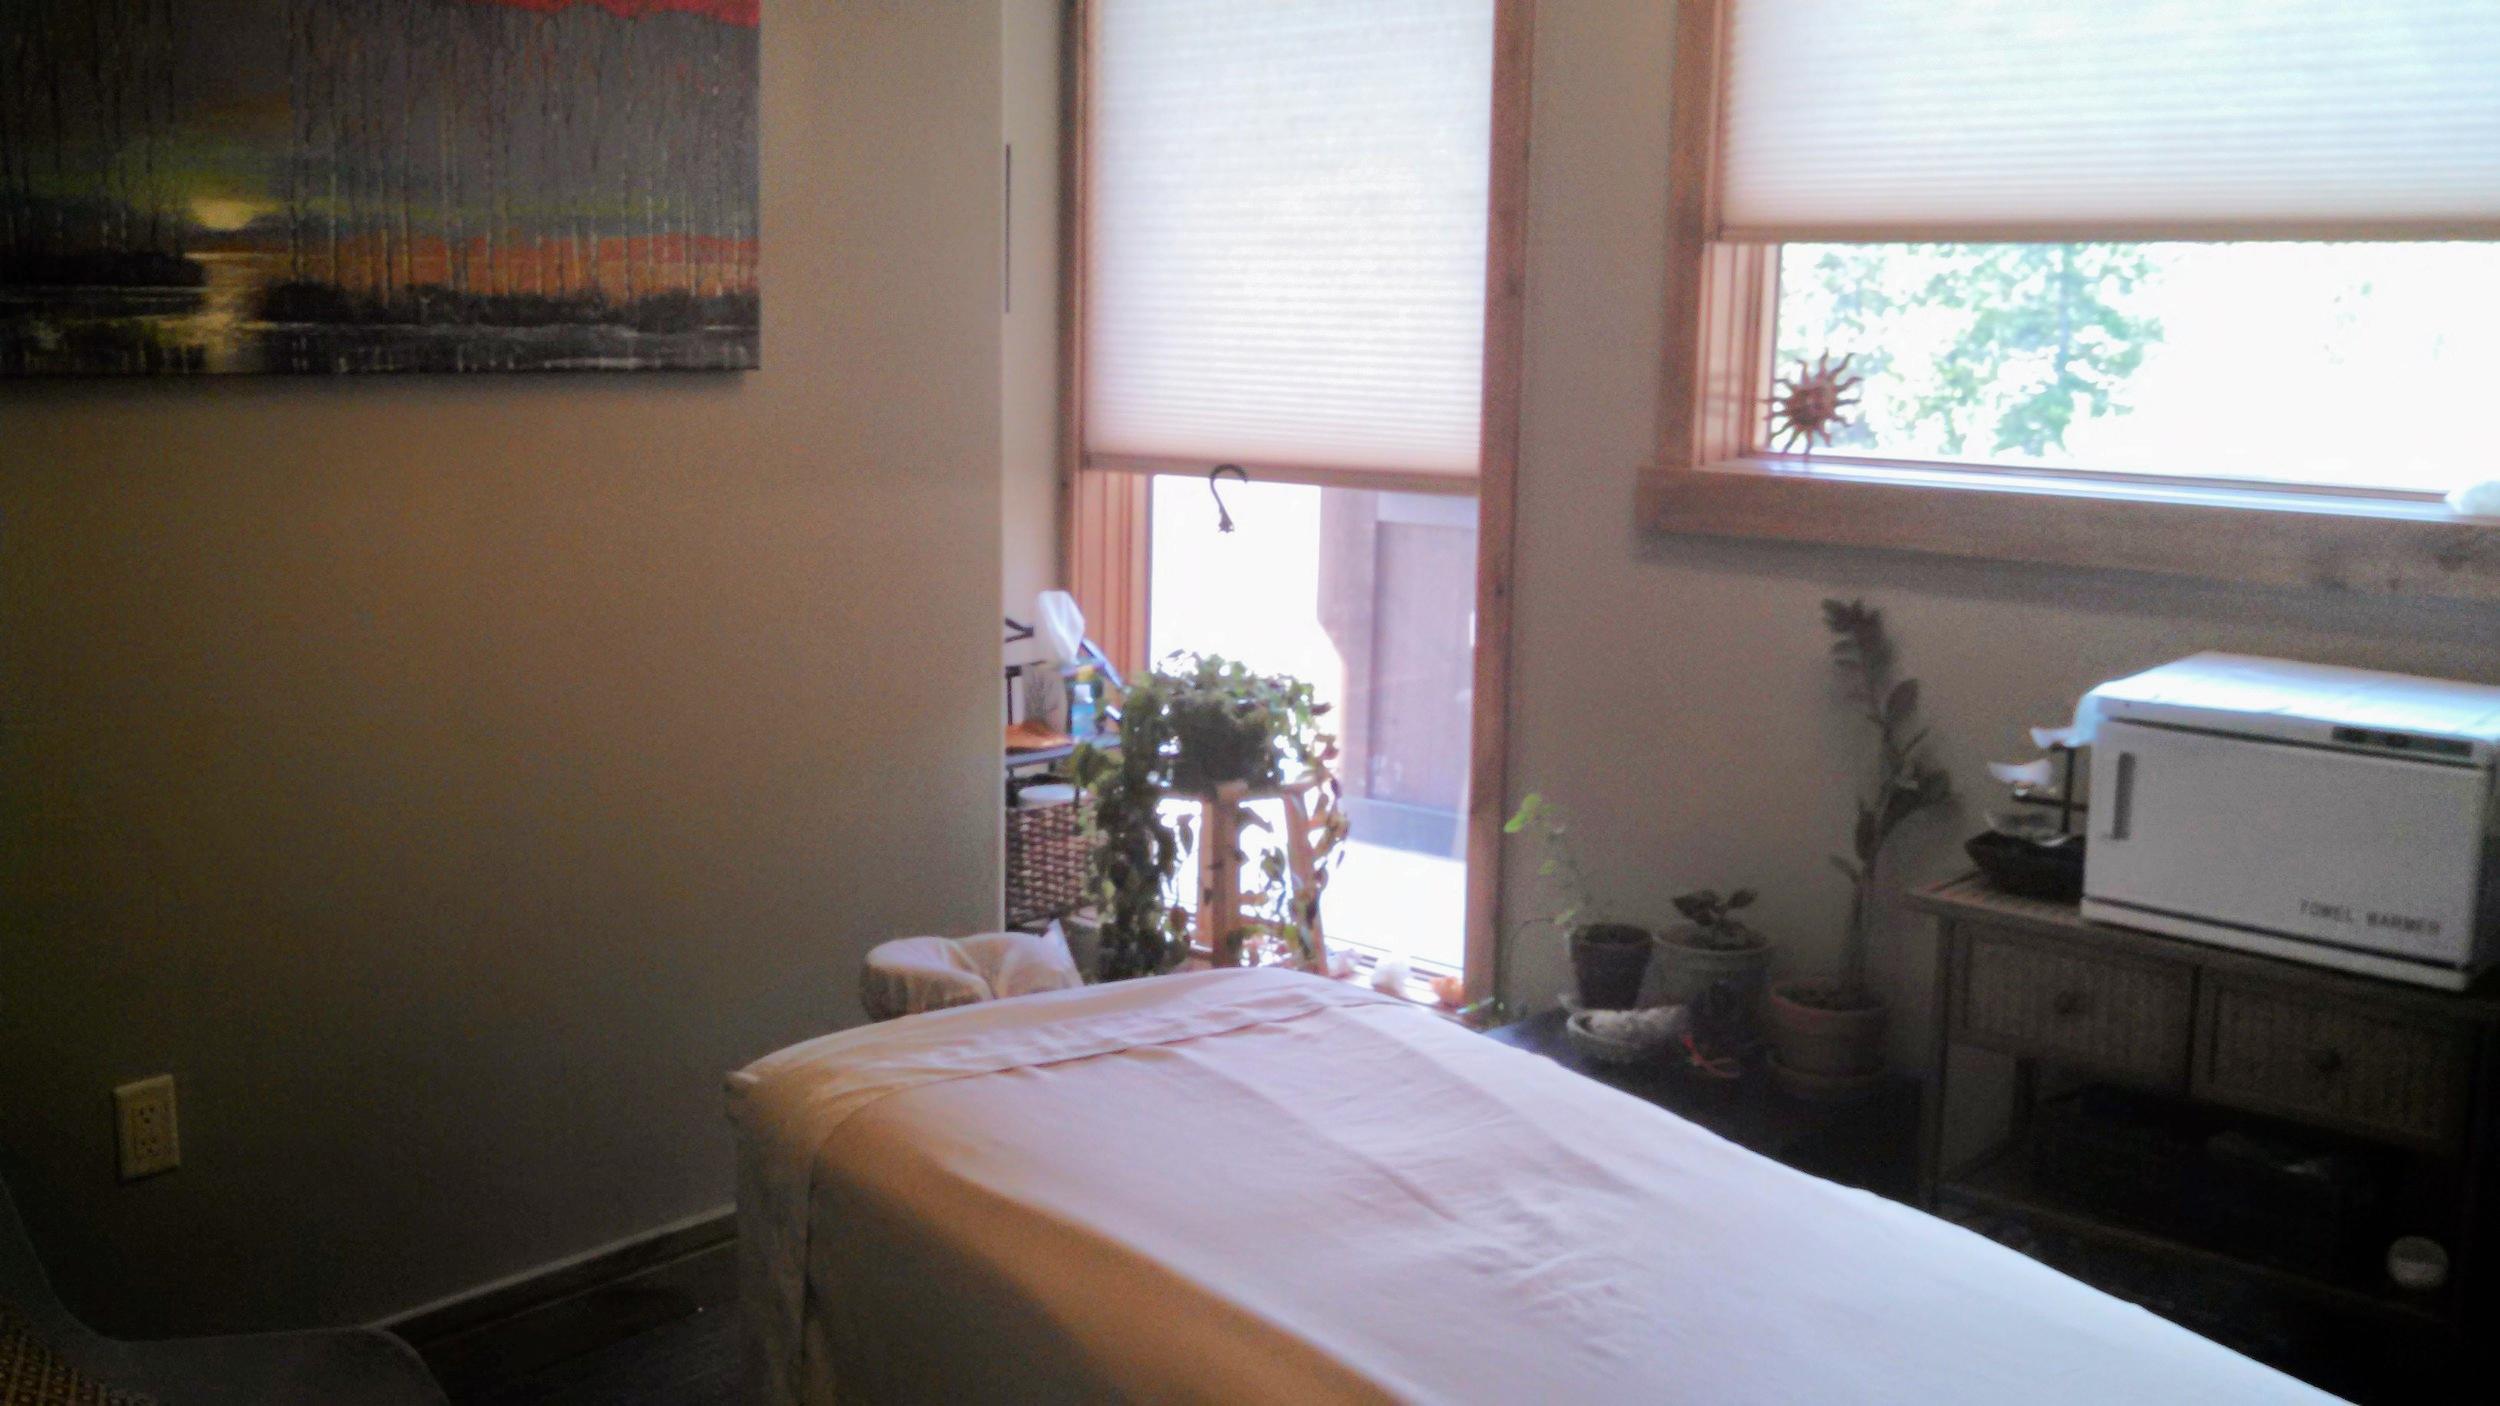 Breckenridge massage studio